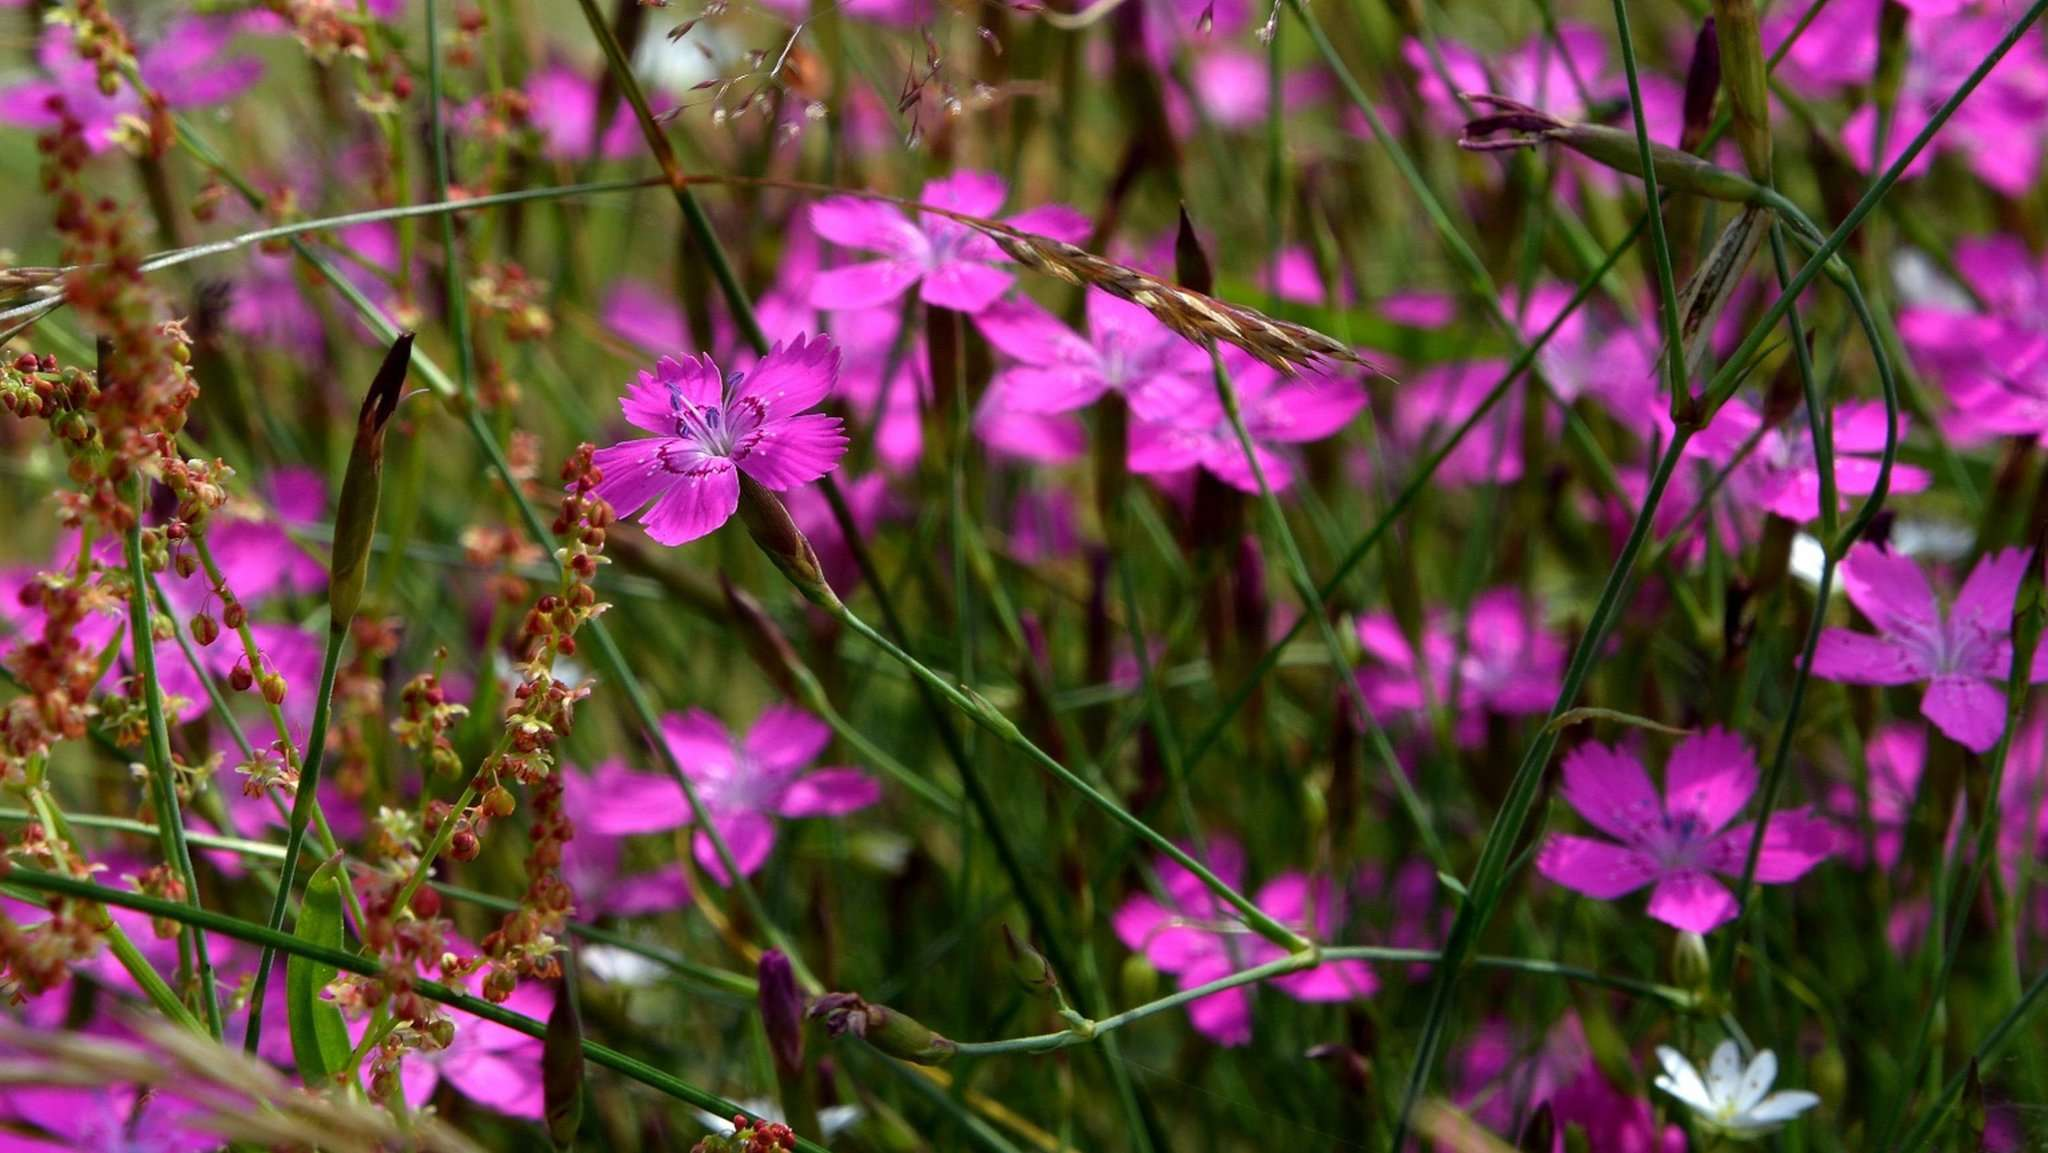 Blüten der Heide-Nelke am Originalstandort. Foto: Joachim Looks